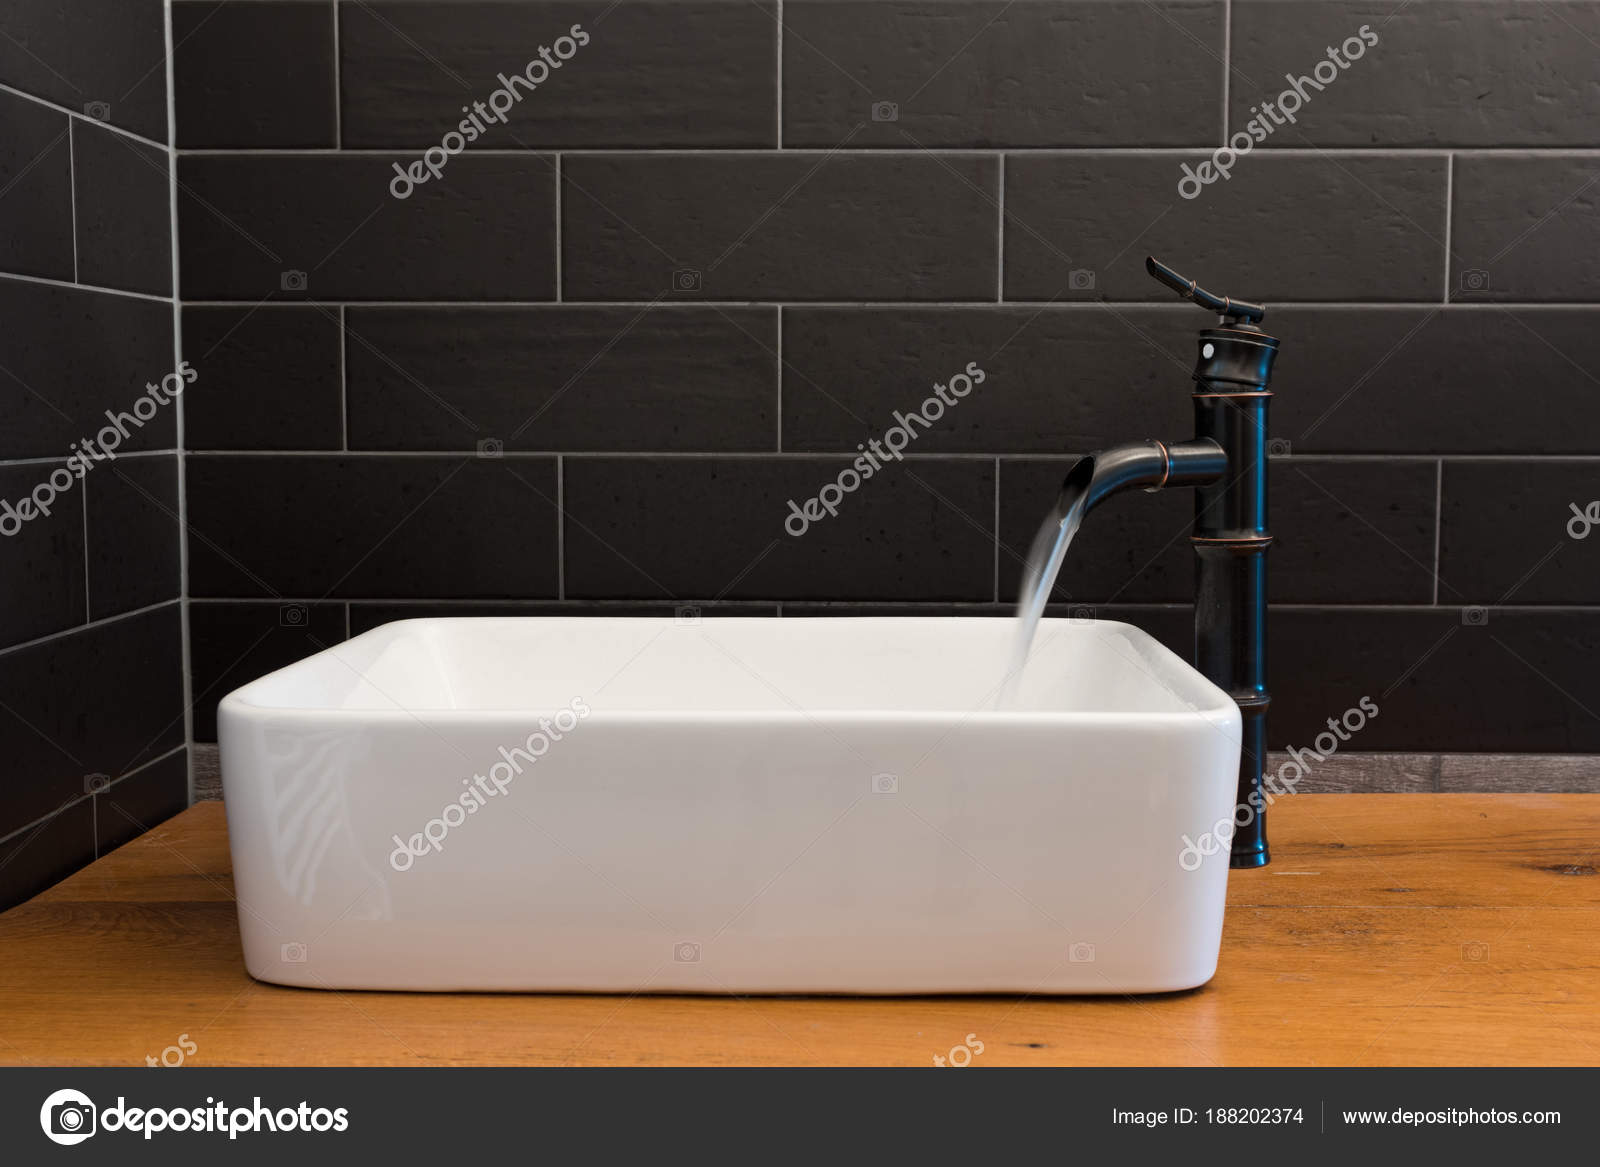 Modern wit vierkant wastafel badkamer met zwarte tegels zwarte kraan